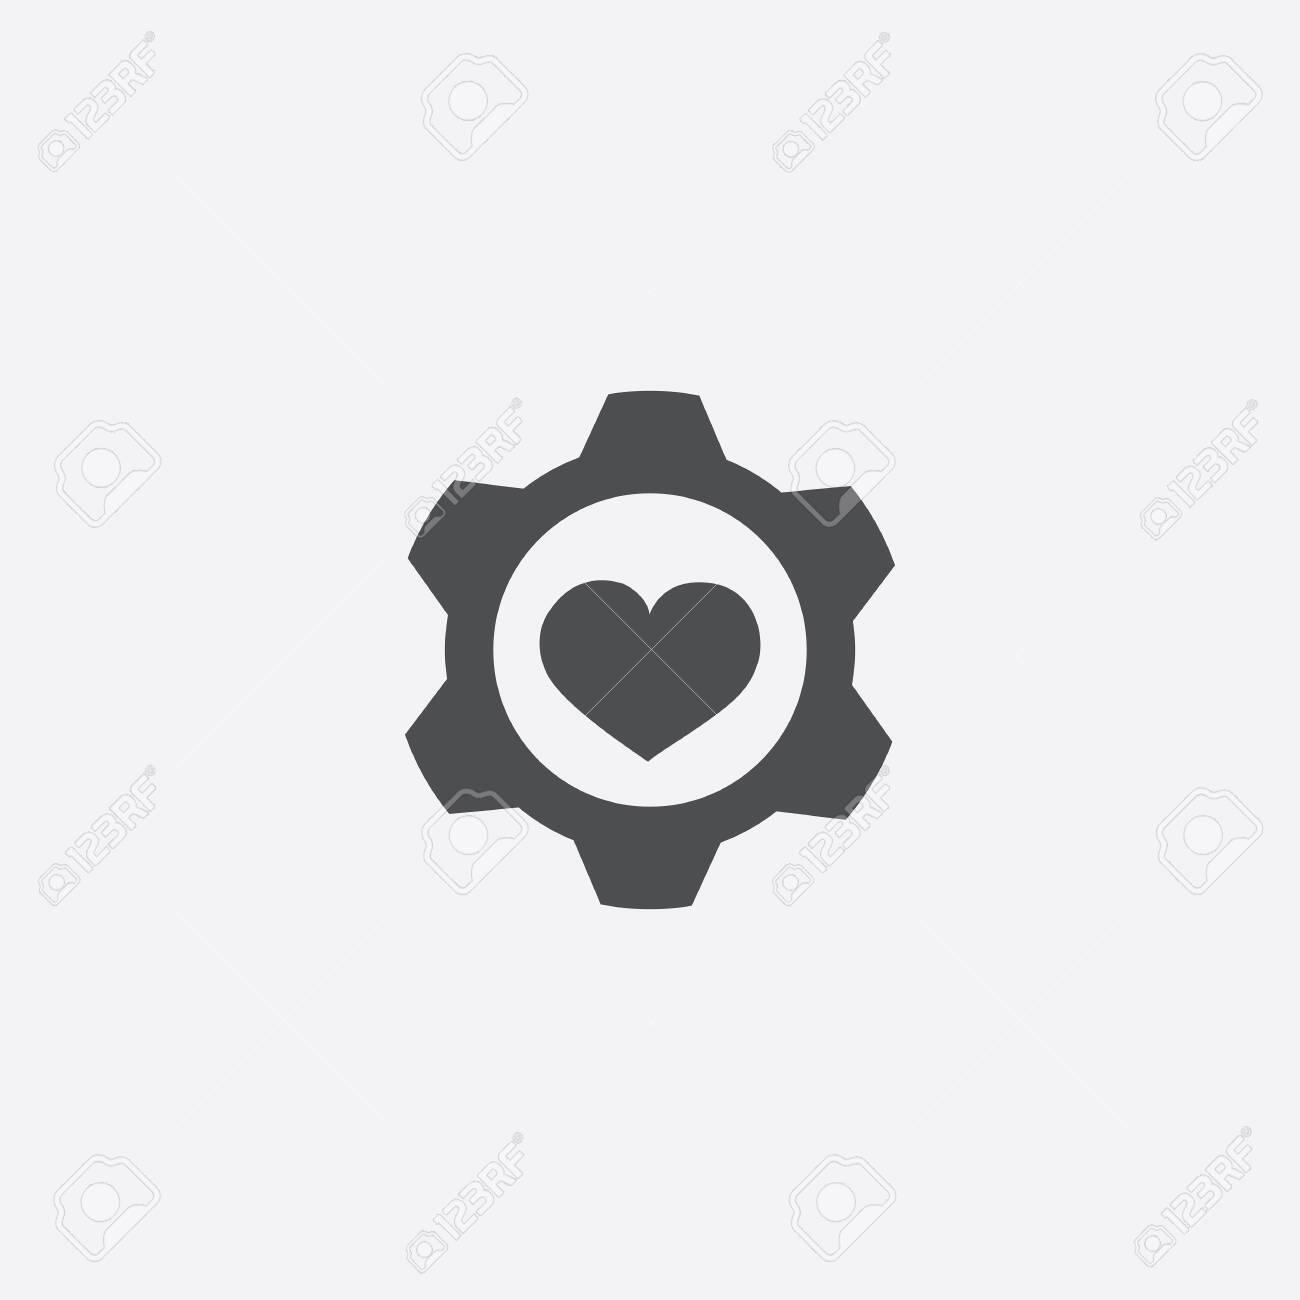 heart setting icon - 143431858